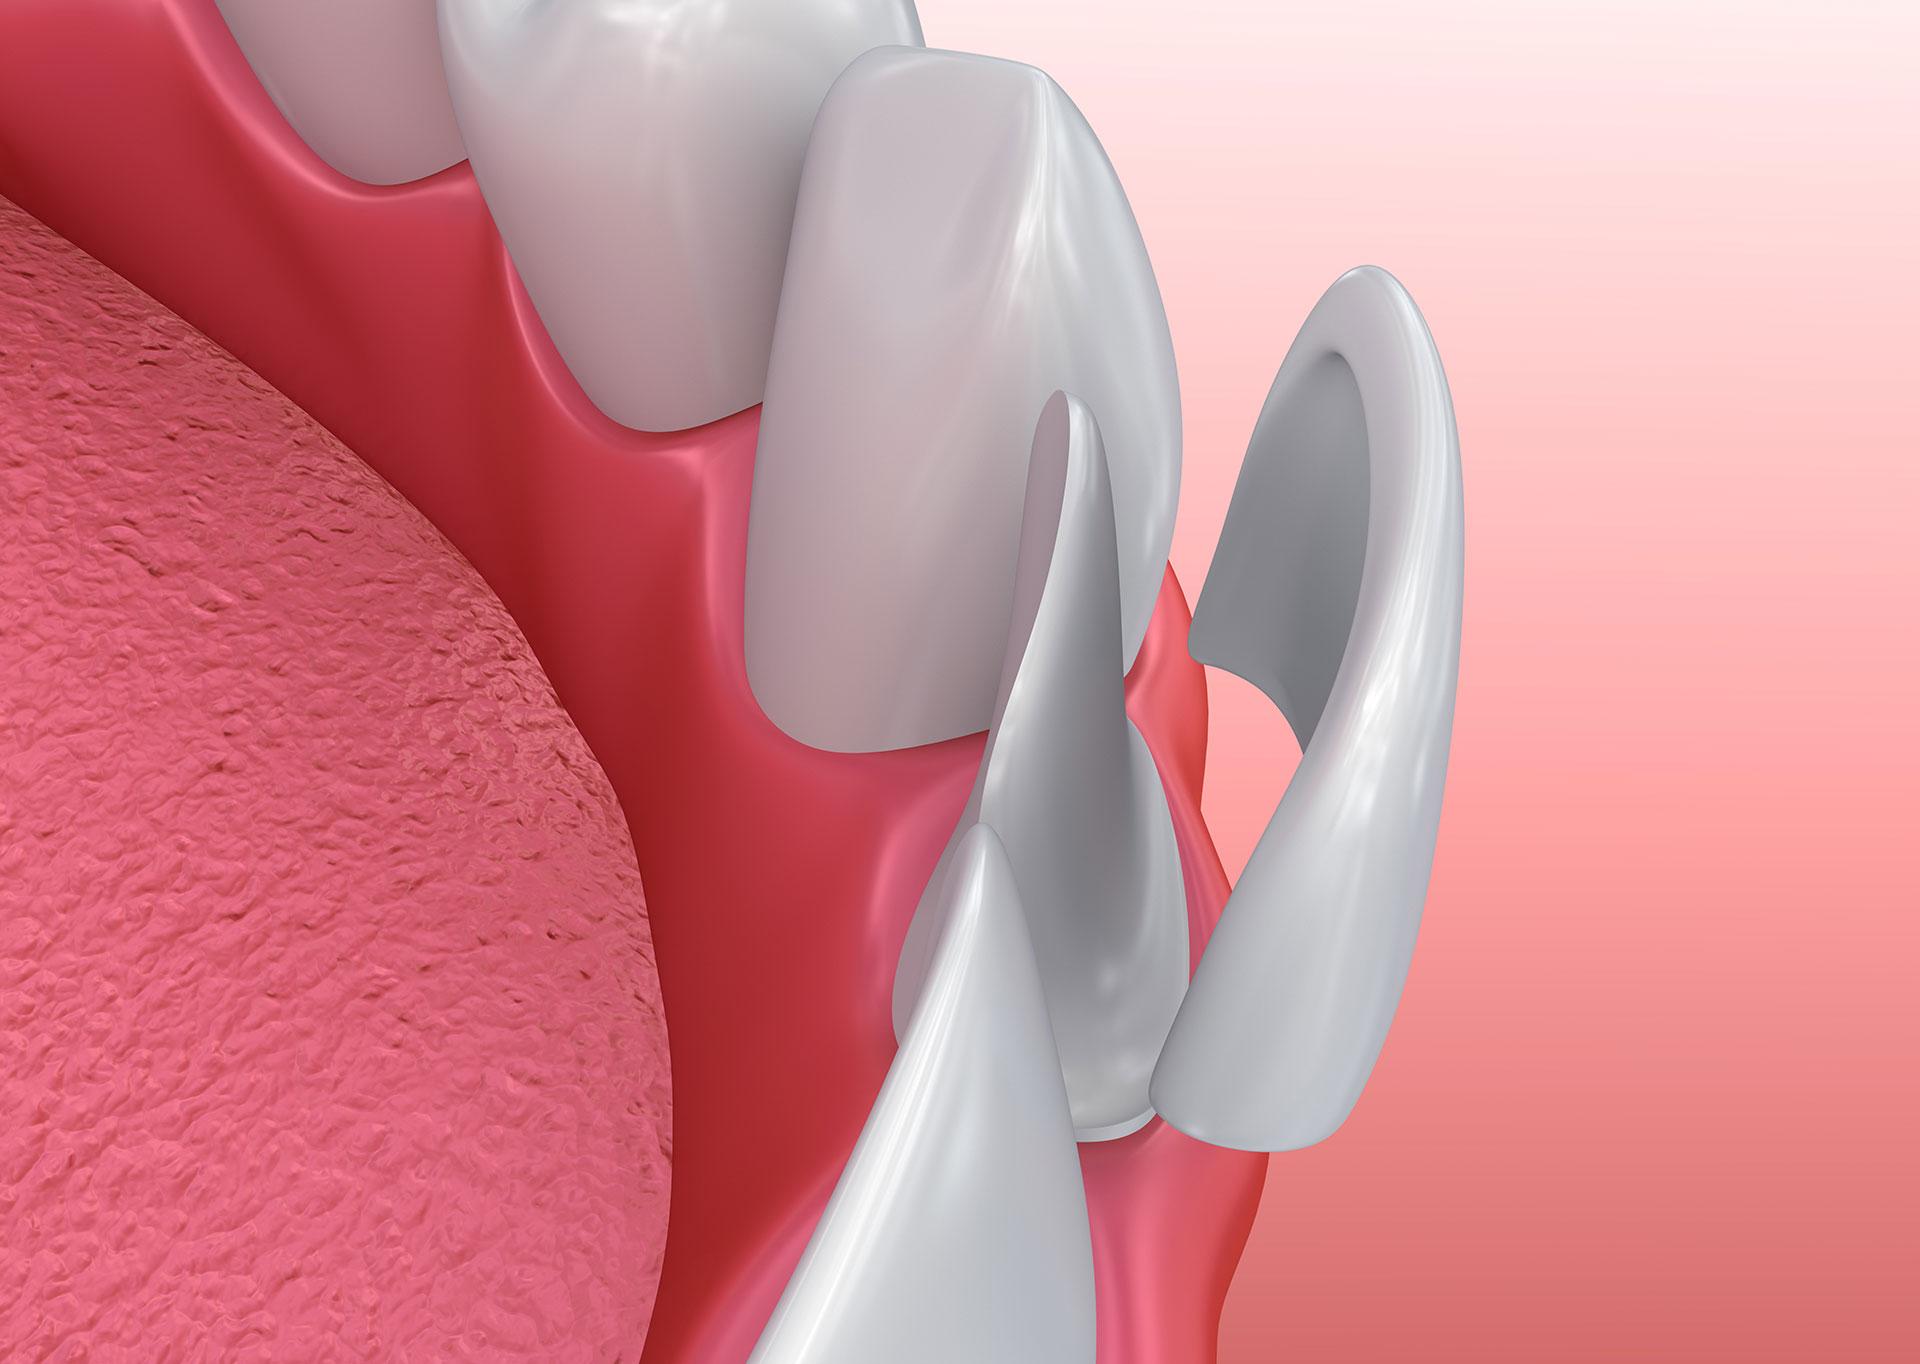 porcelain dental veneers san jose ca